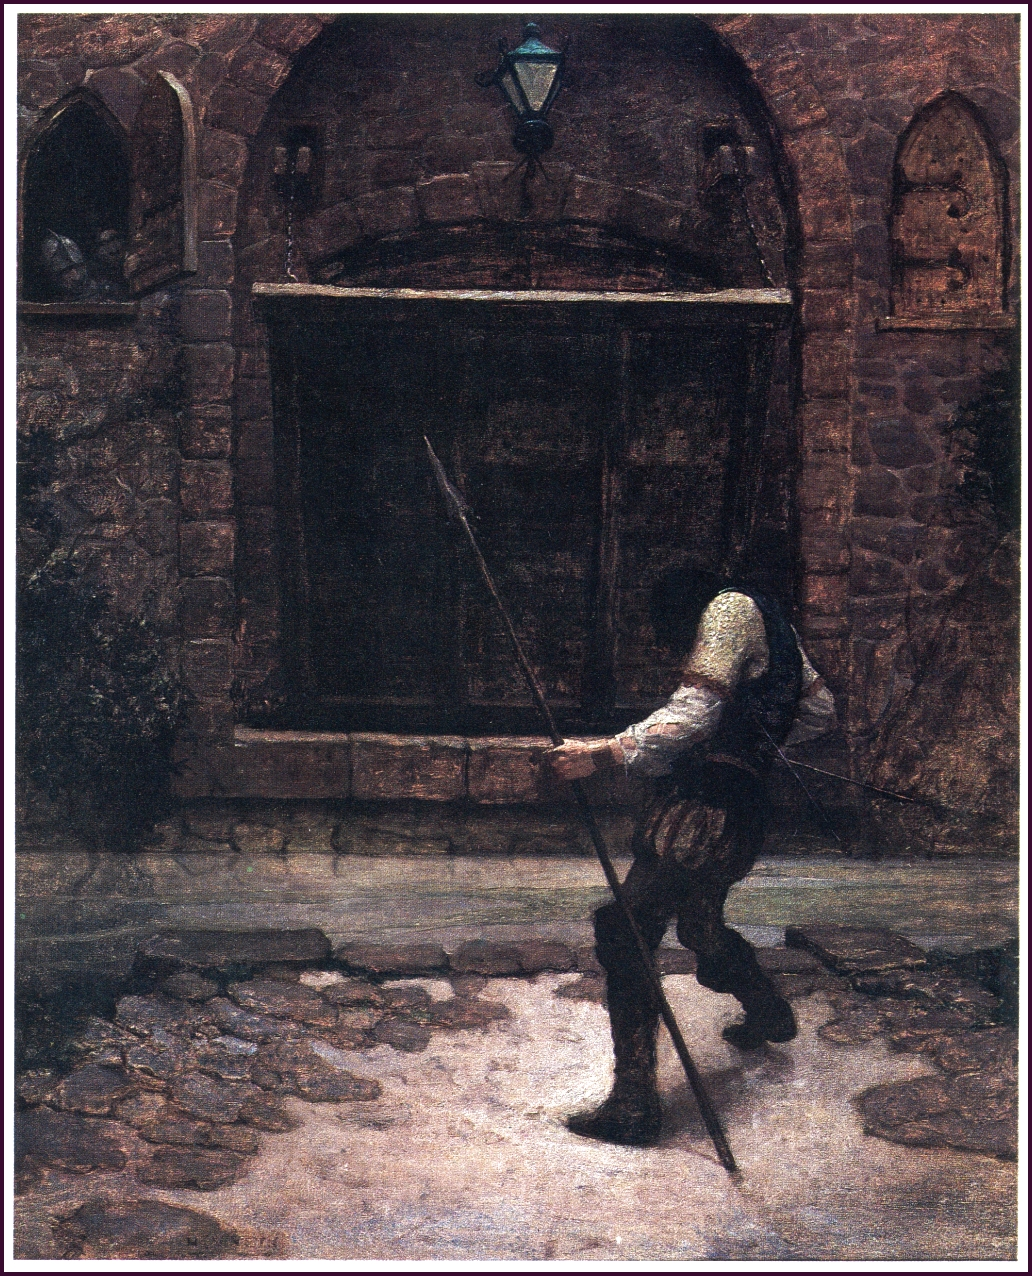 The Black Arrow by Robert Louis Stevenson, 1920